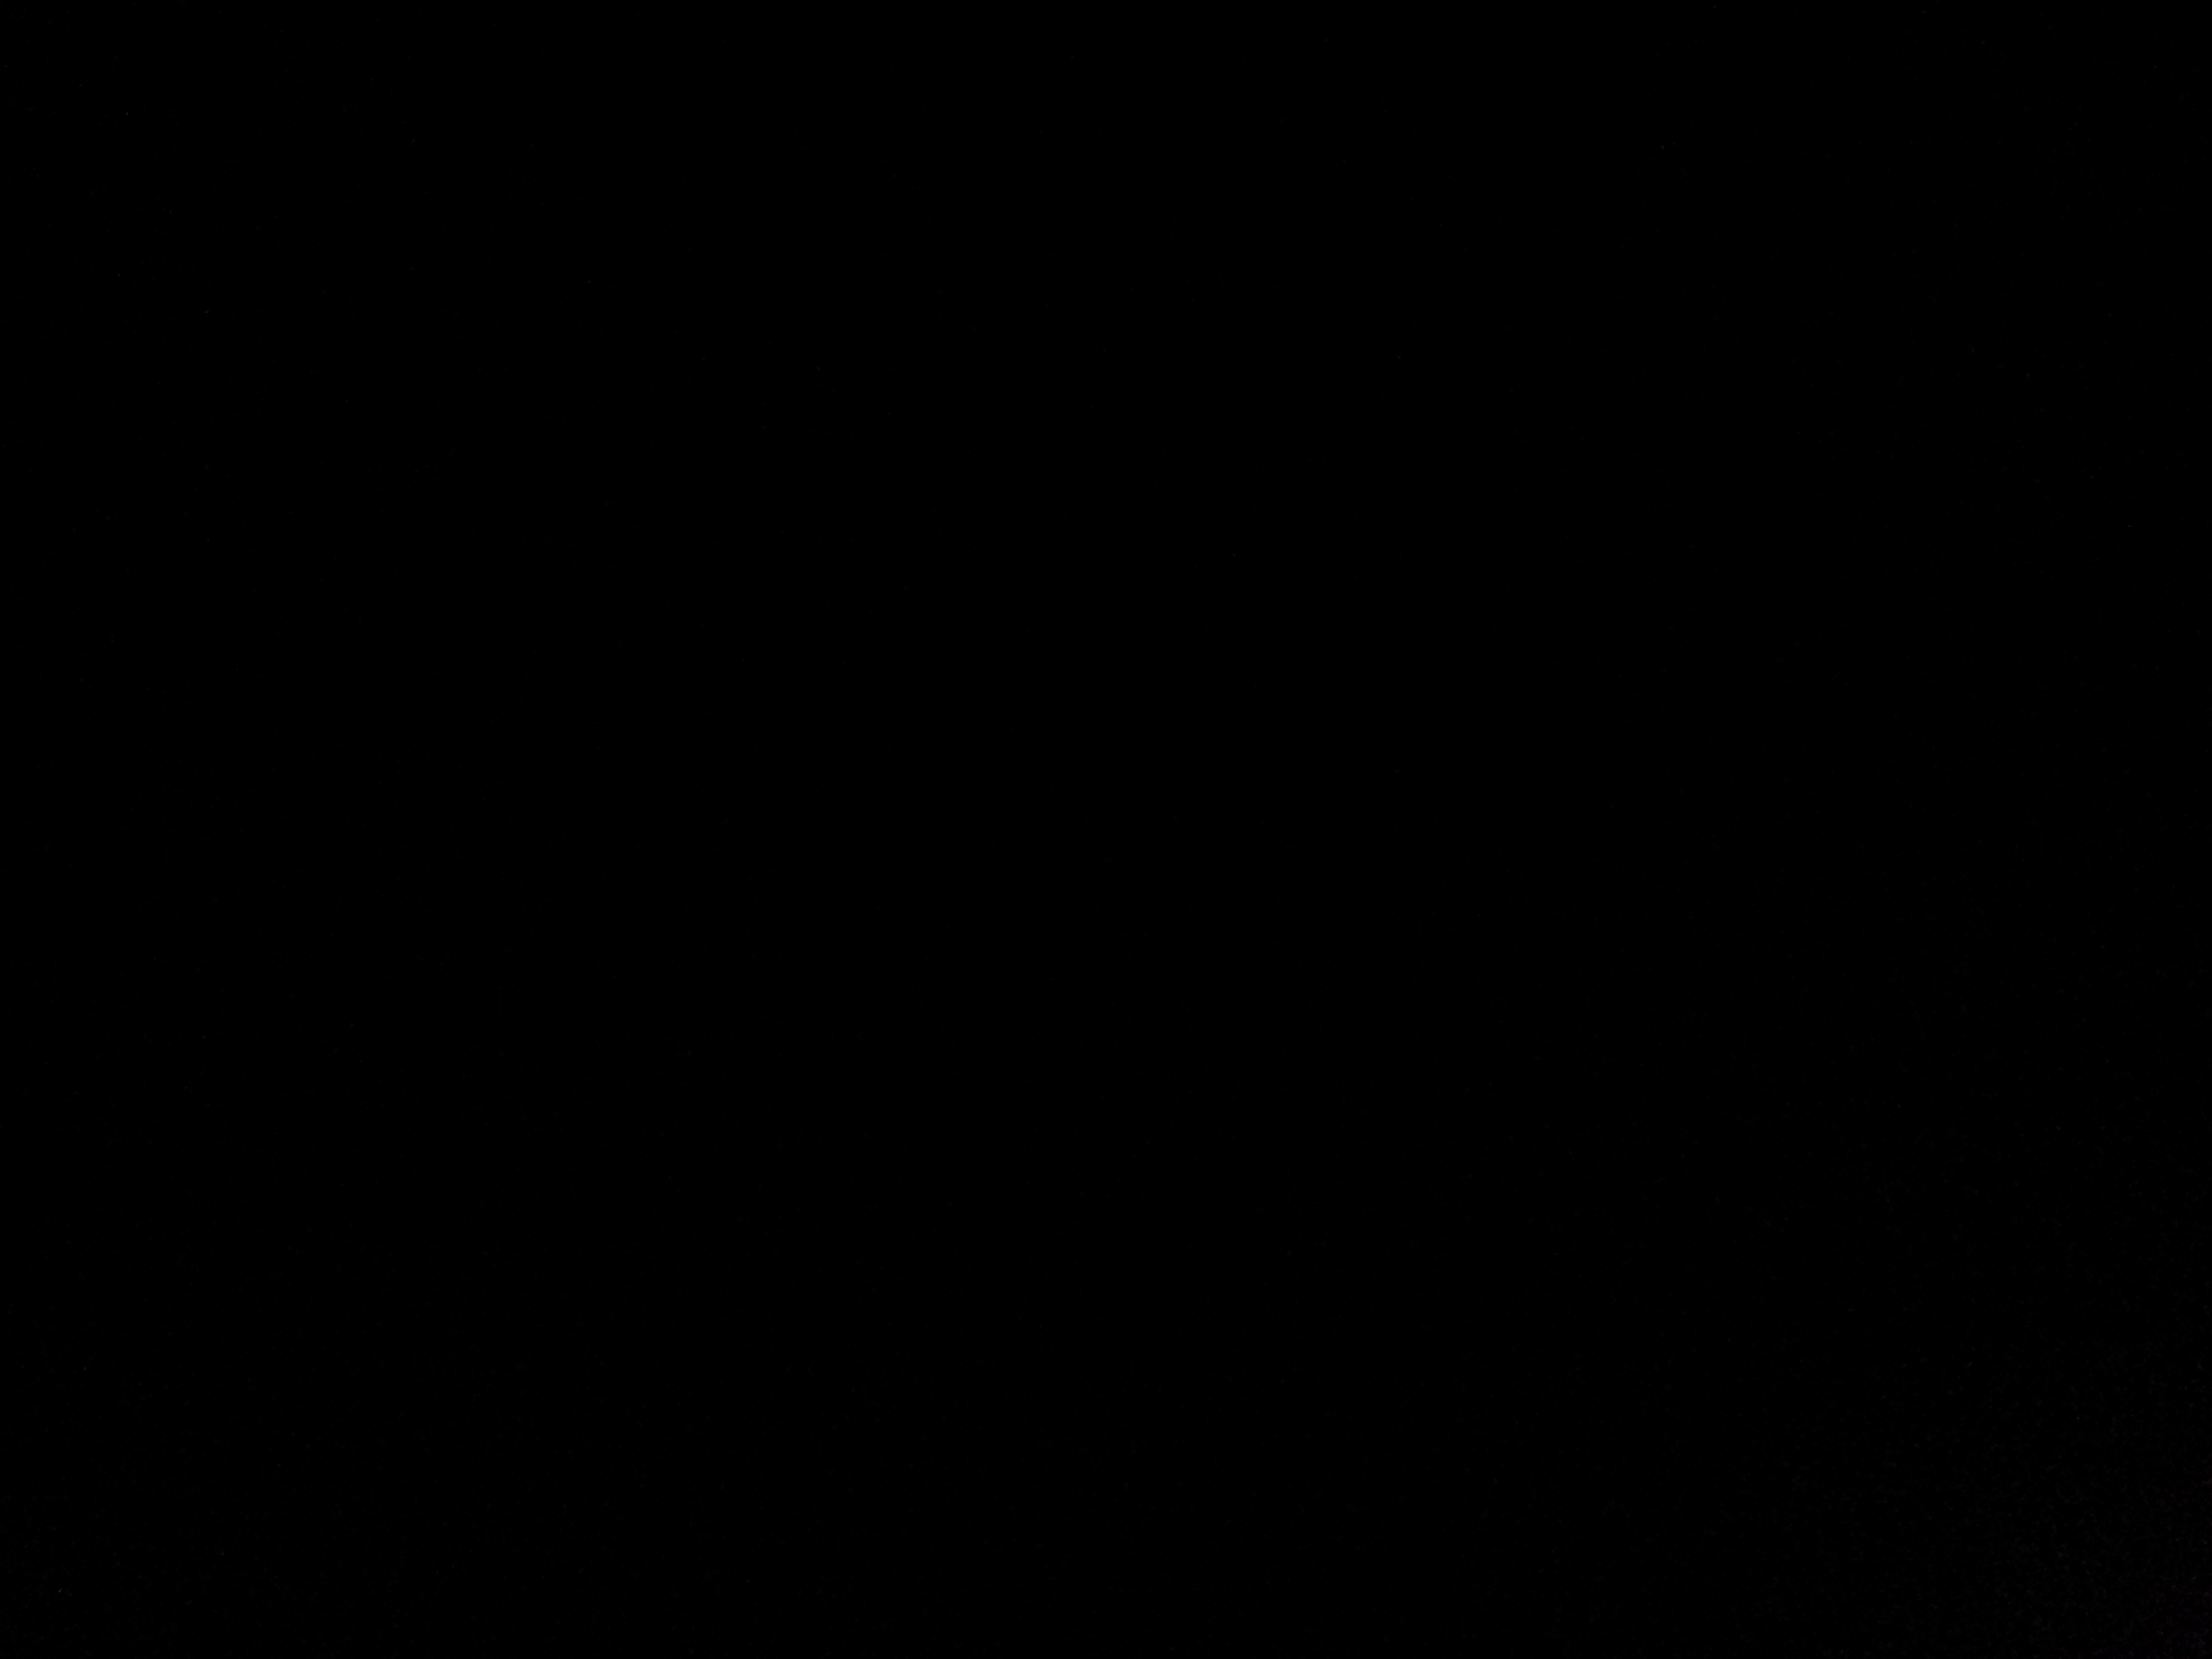 black background 6 3264x2448